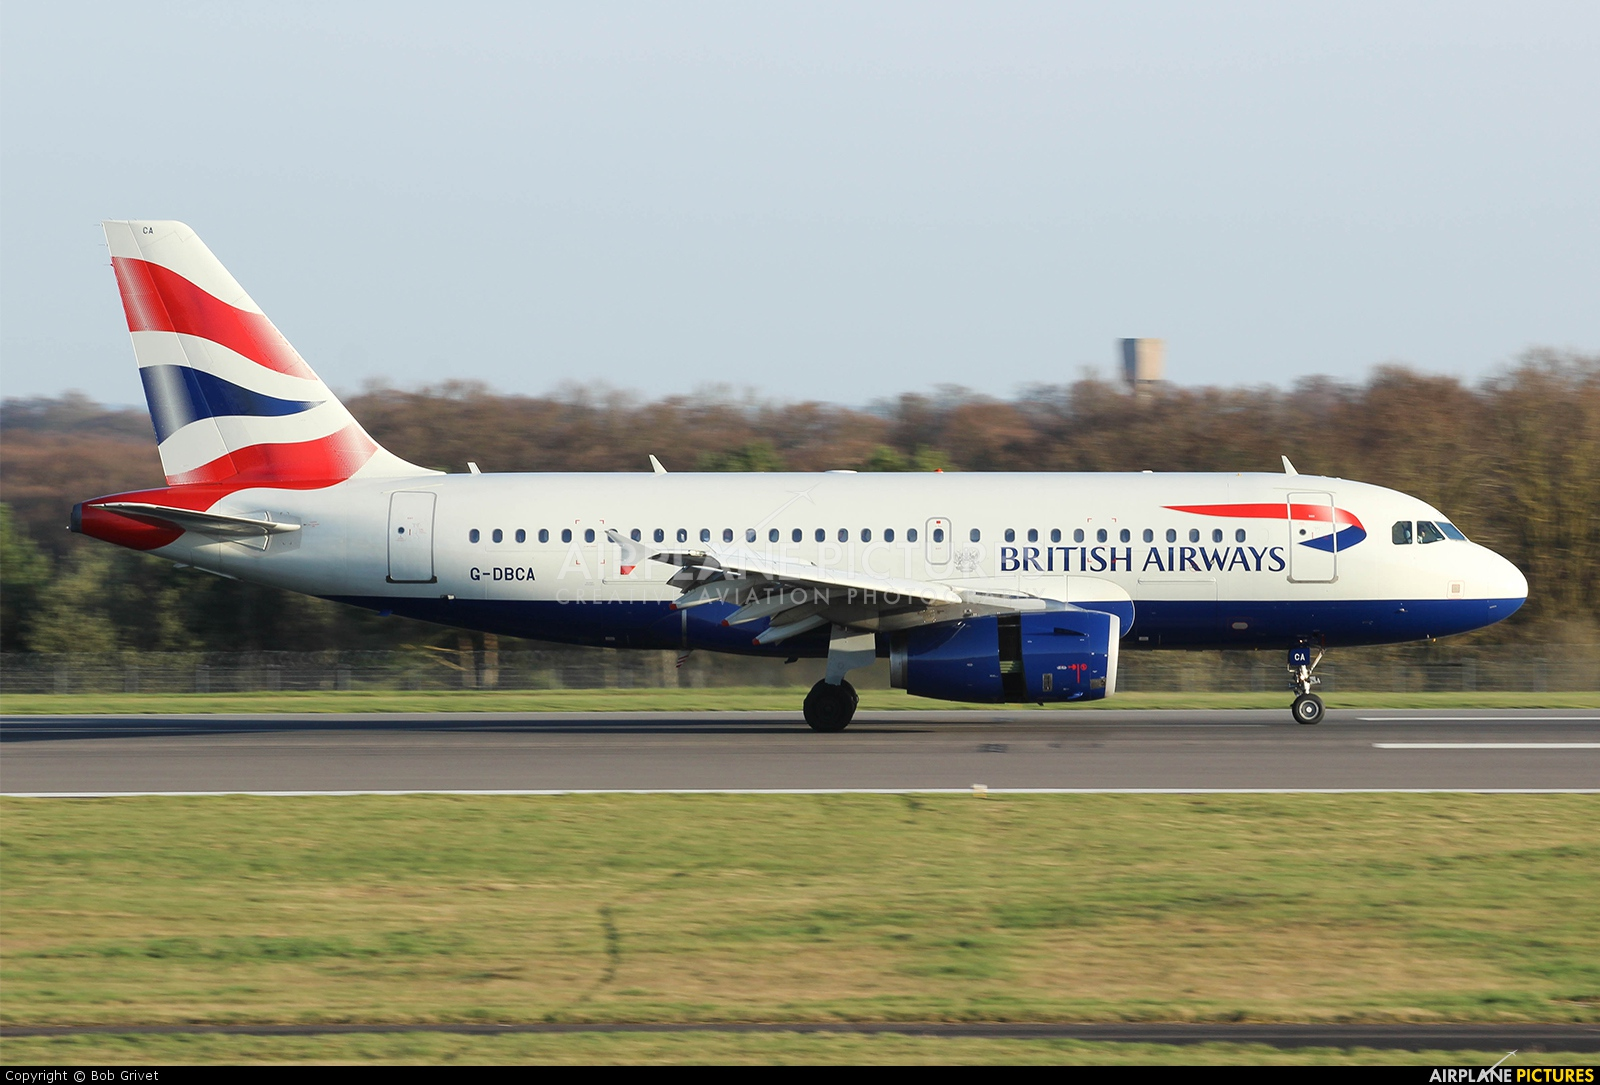 British Airways G-DBCA aircraft at Luxembourg - Findel